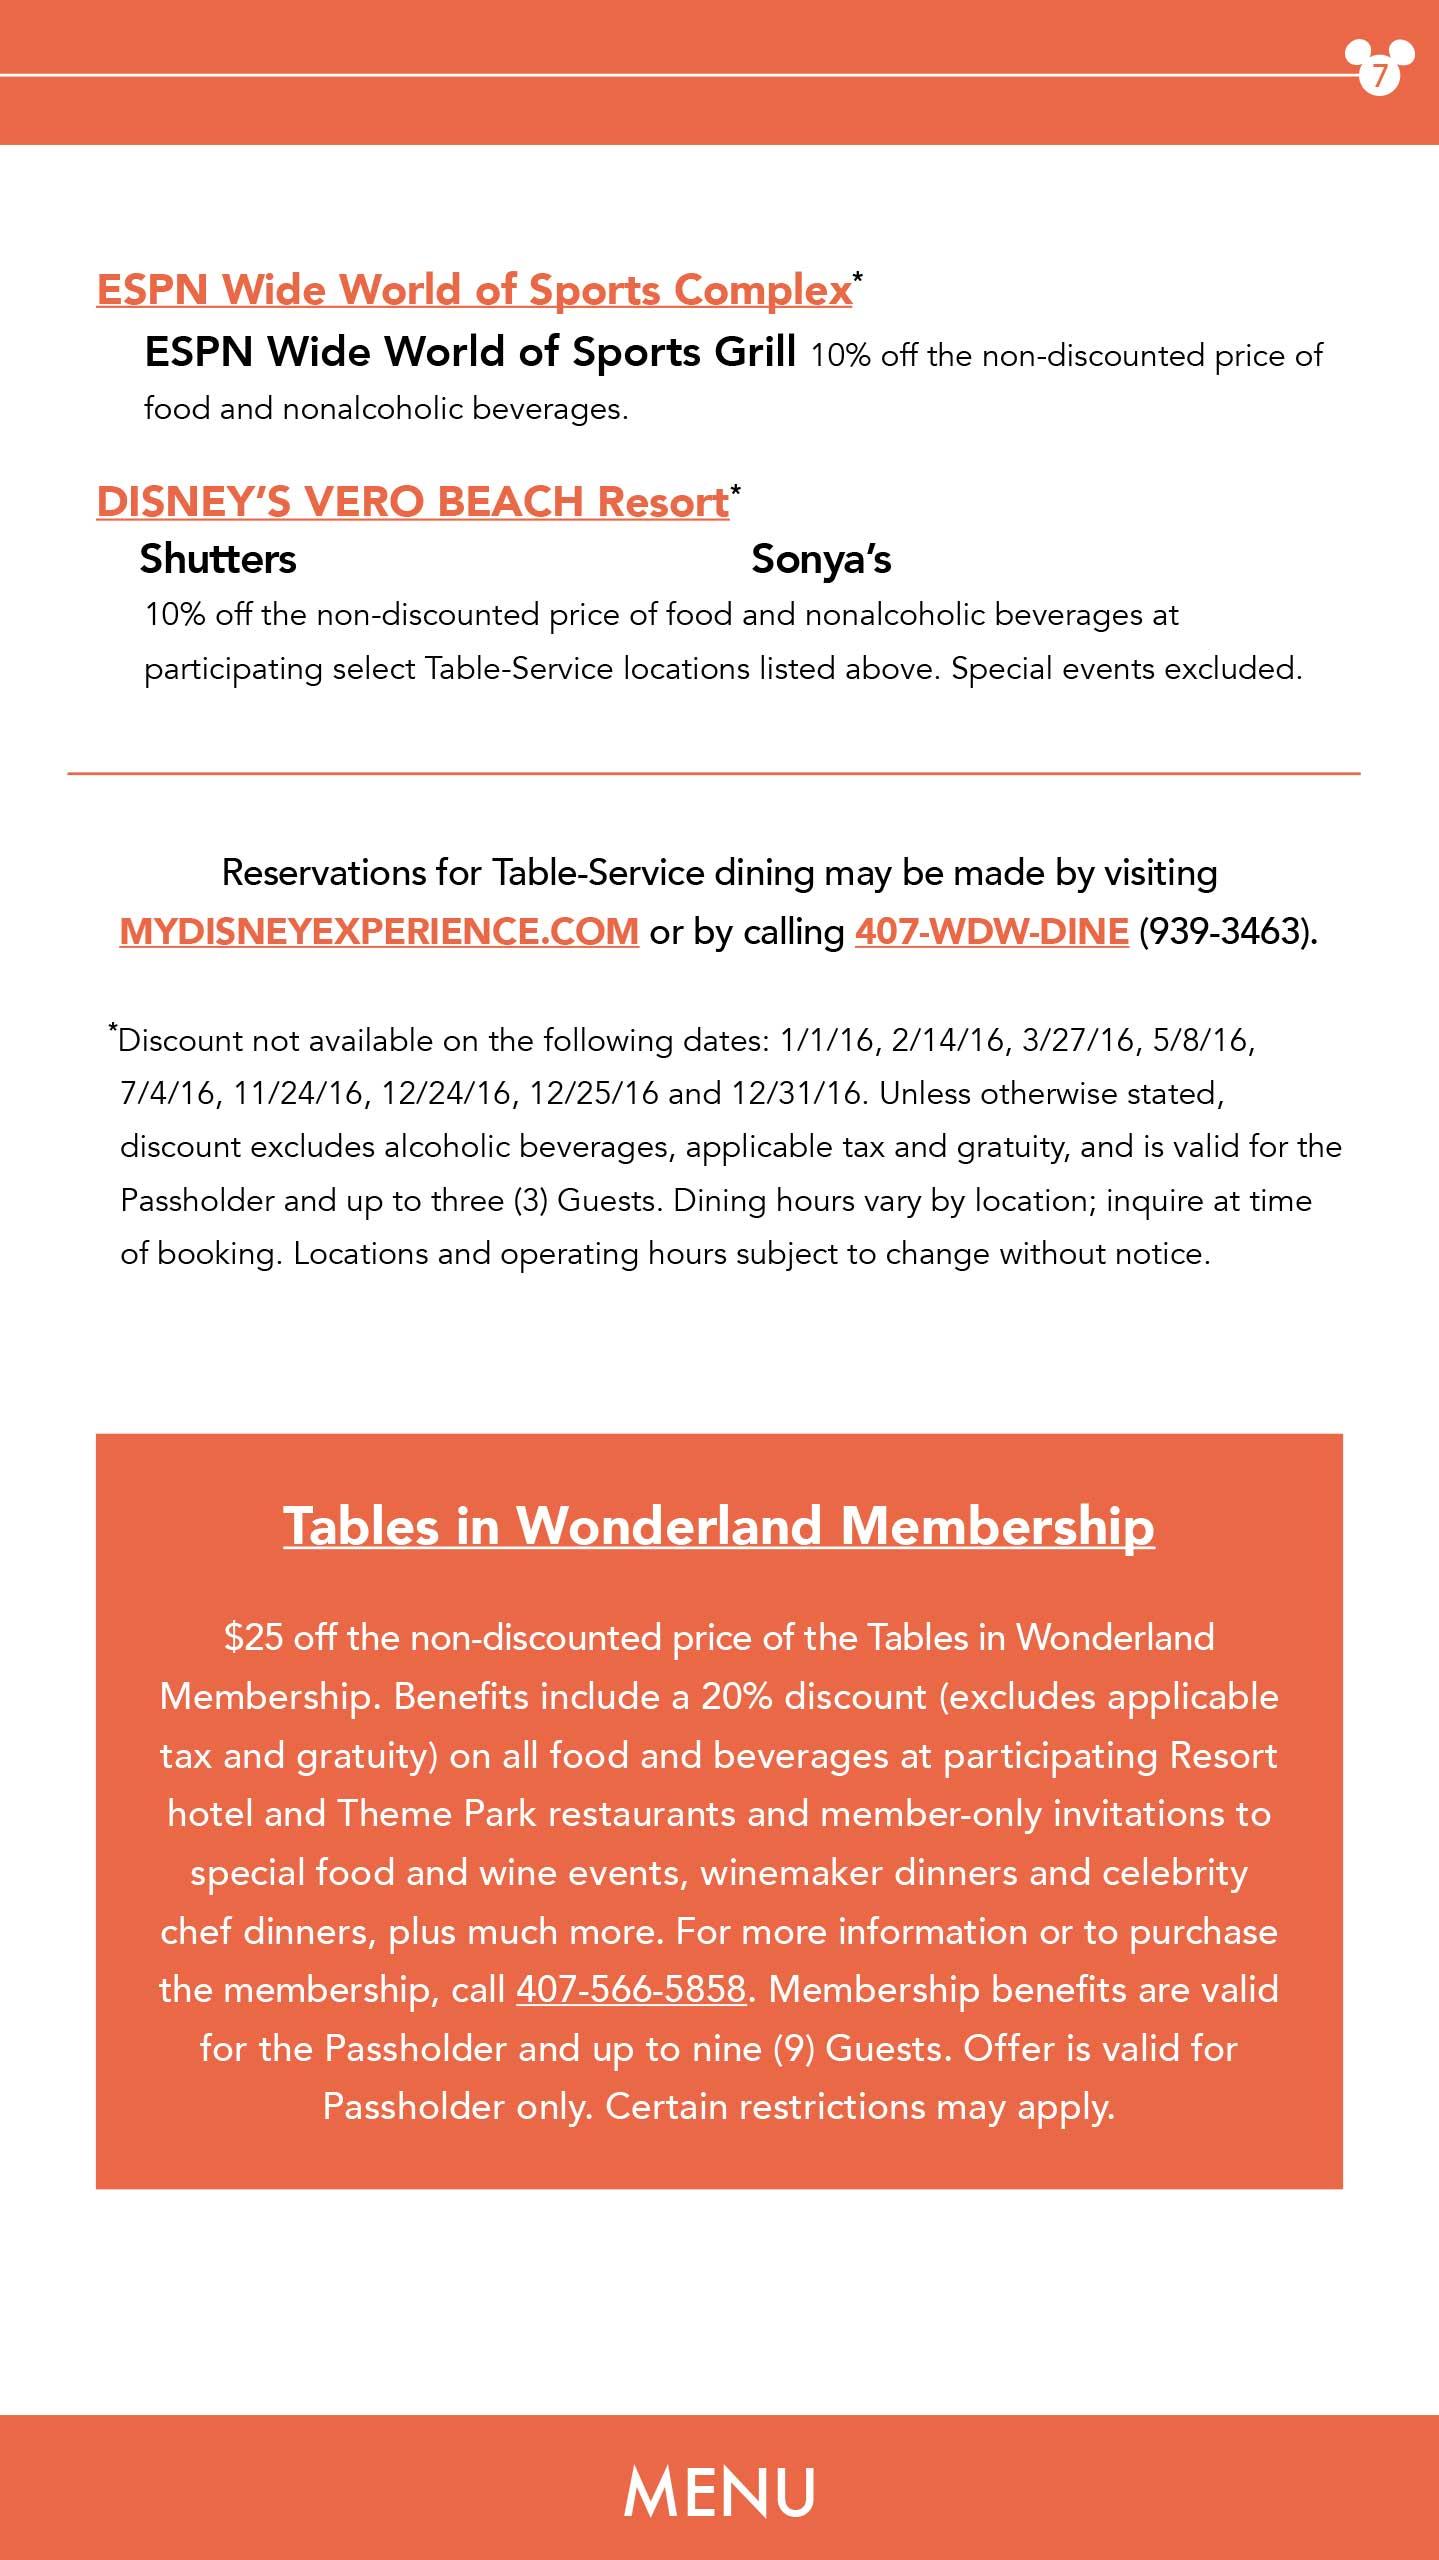 2016 Passholder Benefits Guide